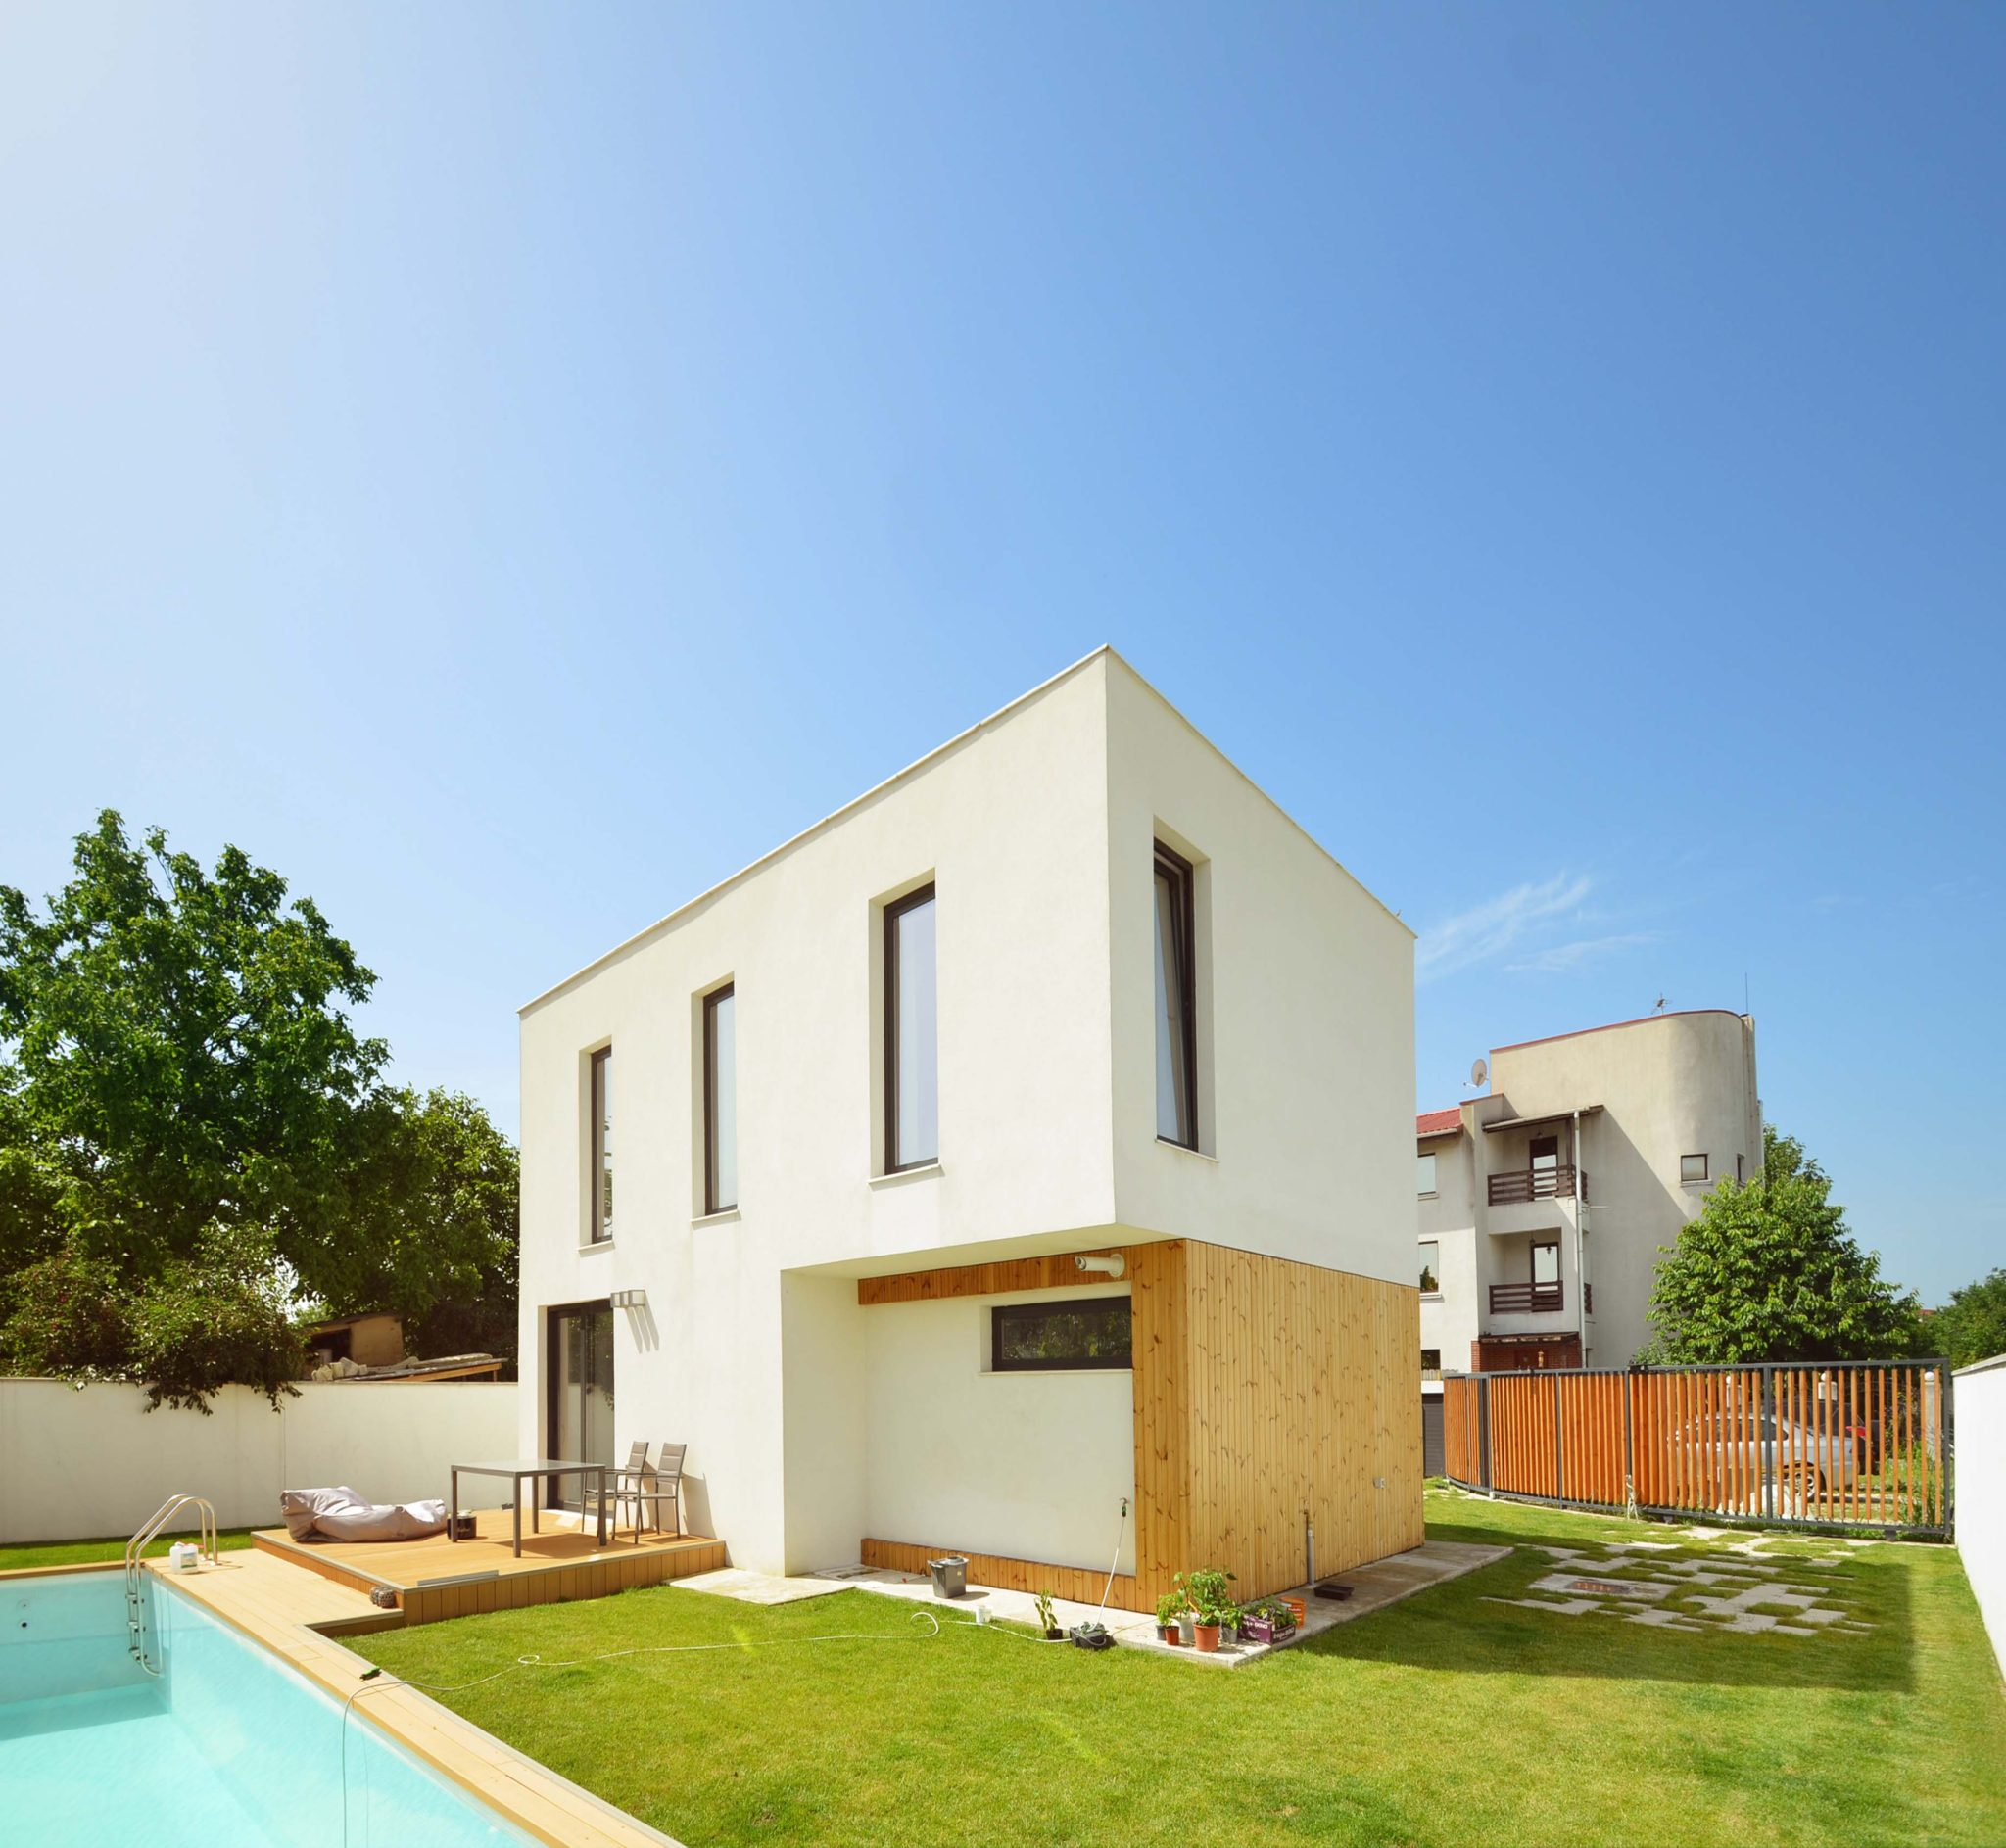 locuinta ytong50cm + piscina (4)